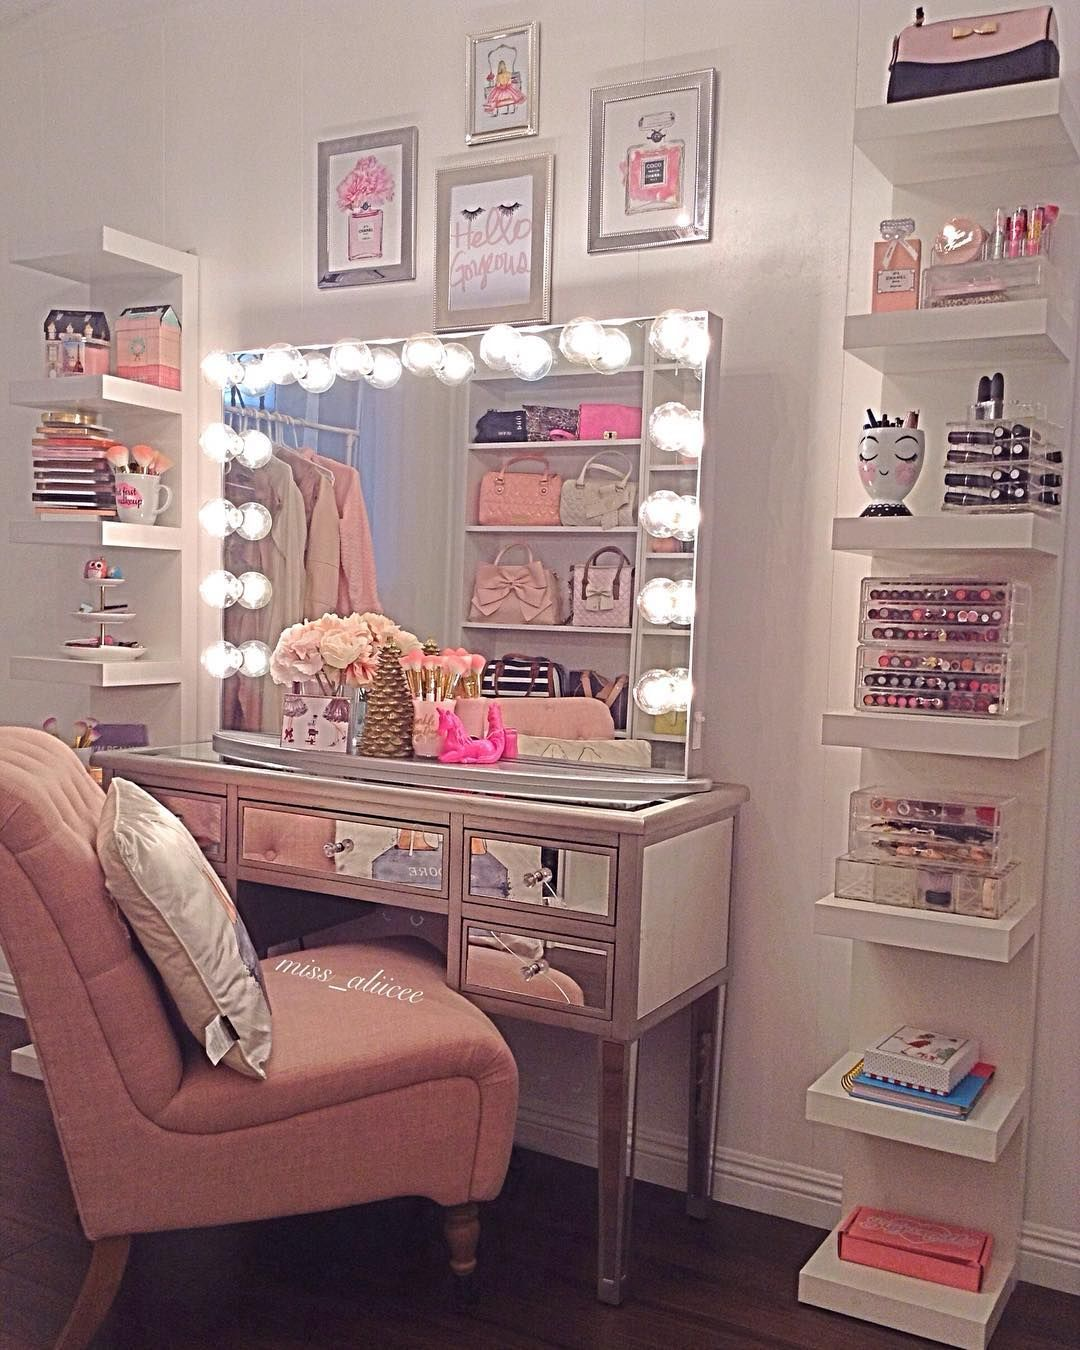 Vanity Bedroom Makeup Dressing Table Room Decor Glam Room